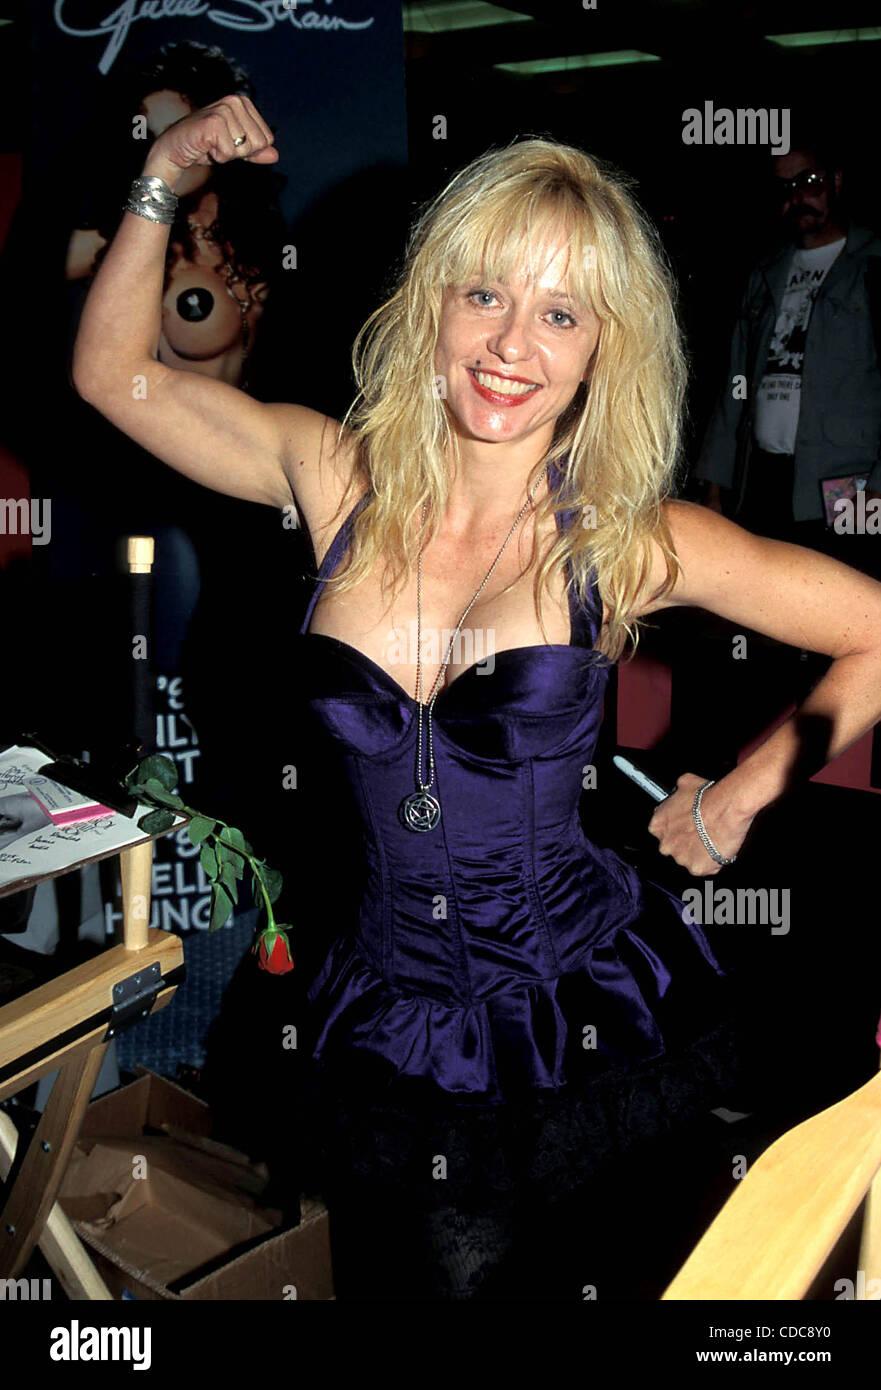 Linnea Quigley nude (78 foto and video), Sexy, Bikini, Boobs, see through 2006